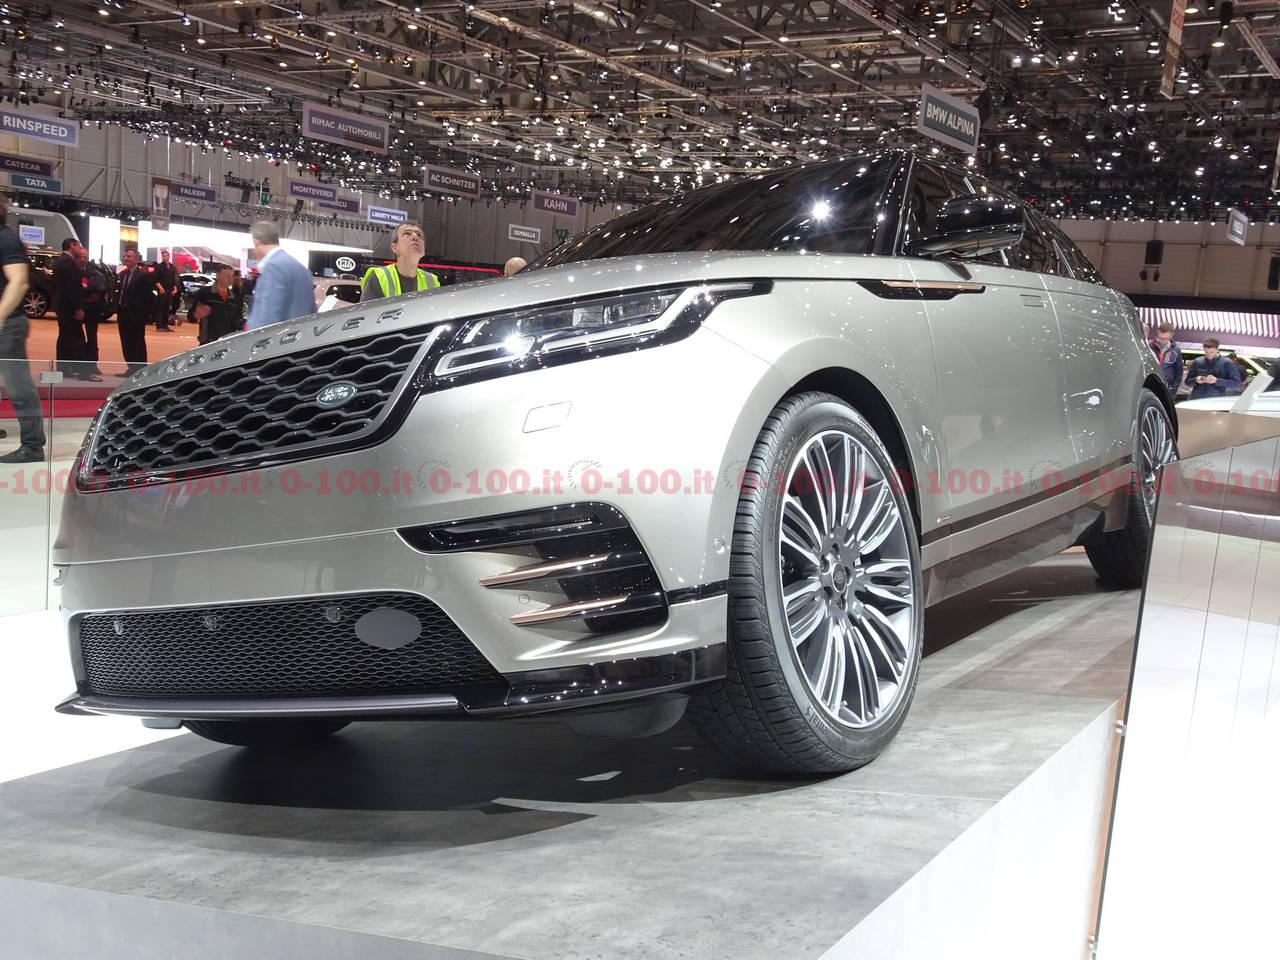 geneva-geneve-ginevra-2017-auto-show-range-rover-velar-0-100_6